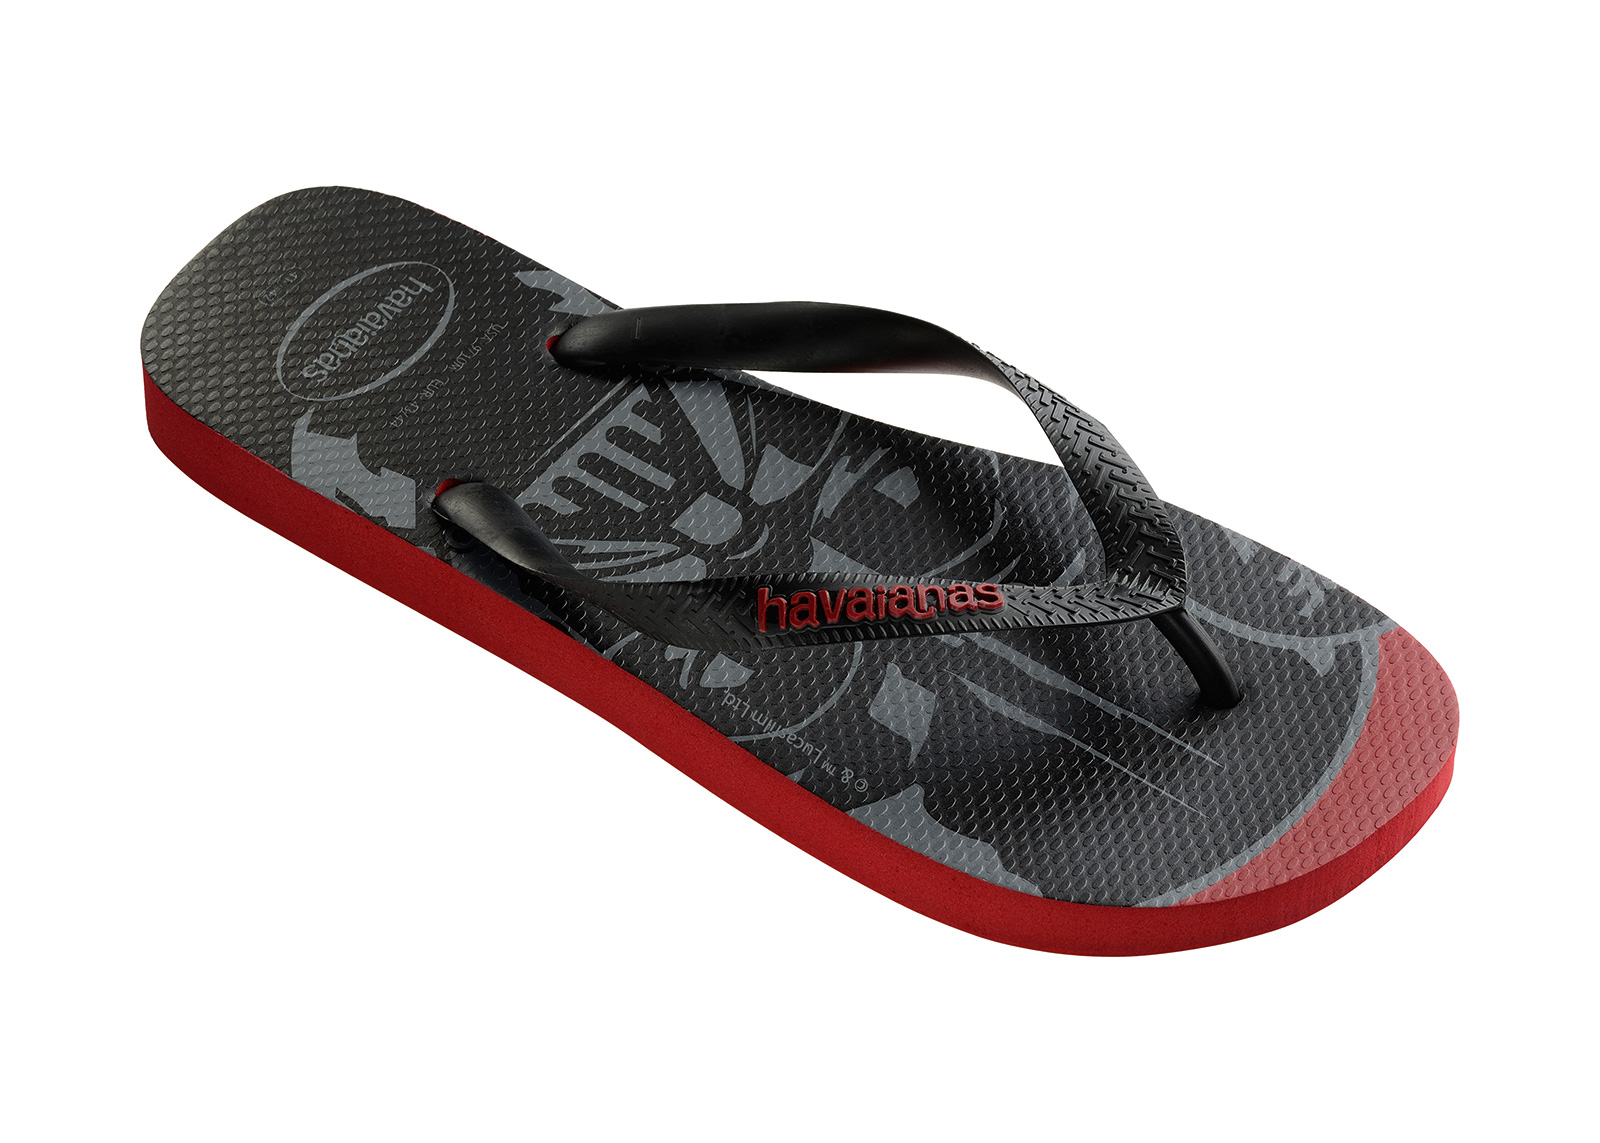 a8159f0e0bb93b Flip-Flops Flip-flops - Havaianas Star Wars Red - Brand Havaianas